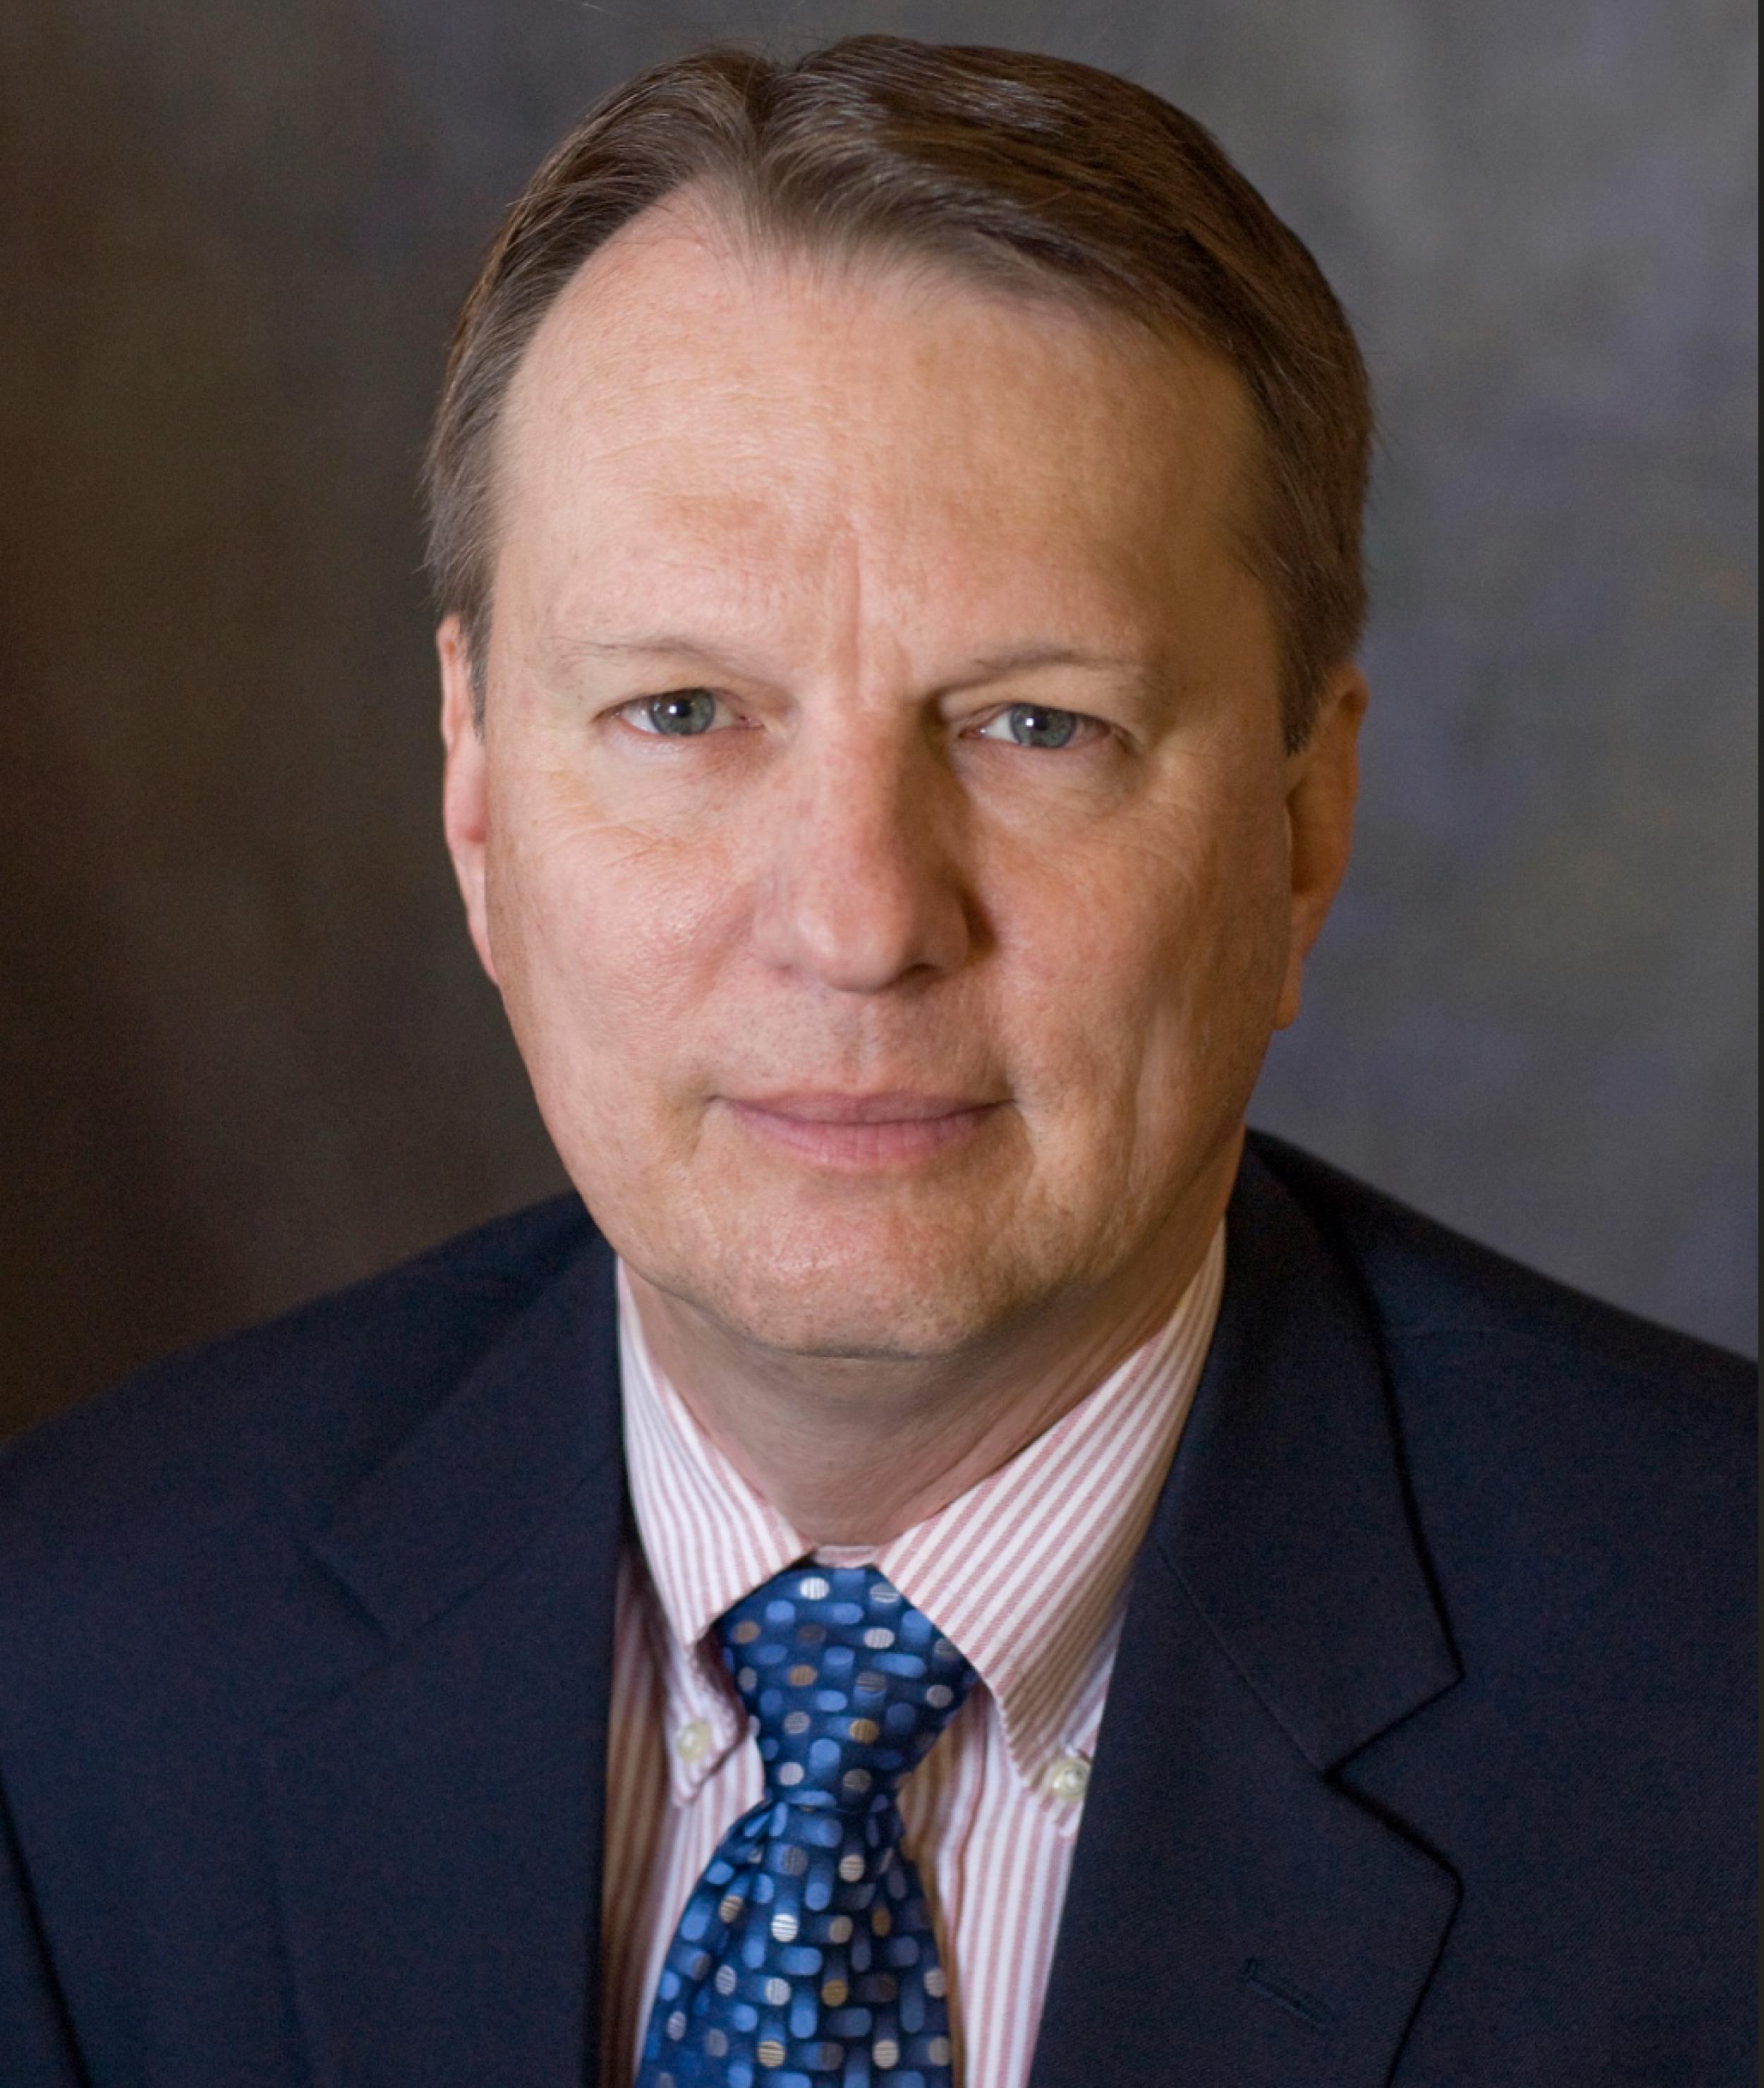 Doug Baker OptimizeRx Chief Financial Officer CFO